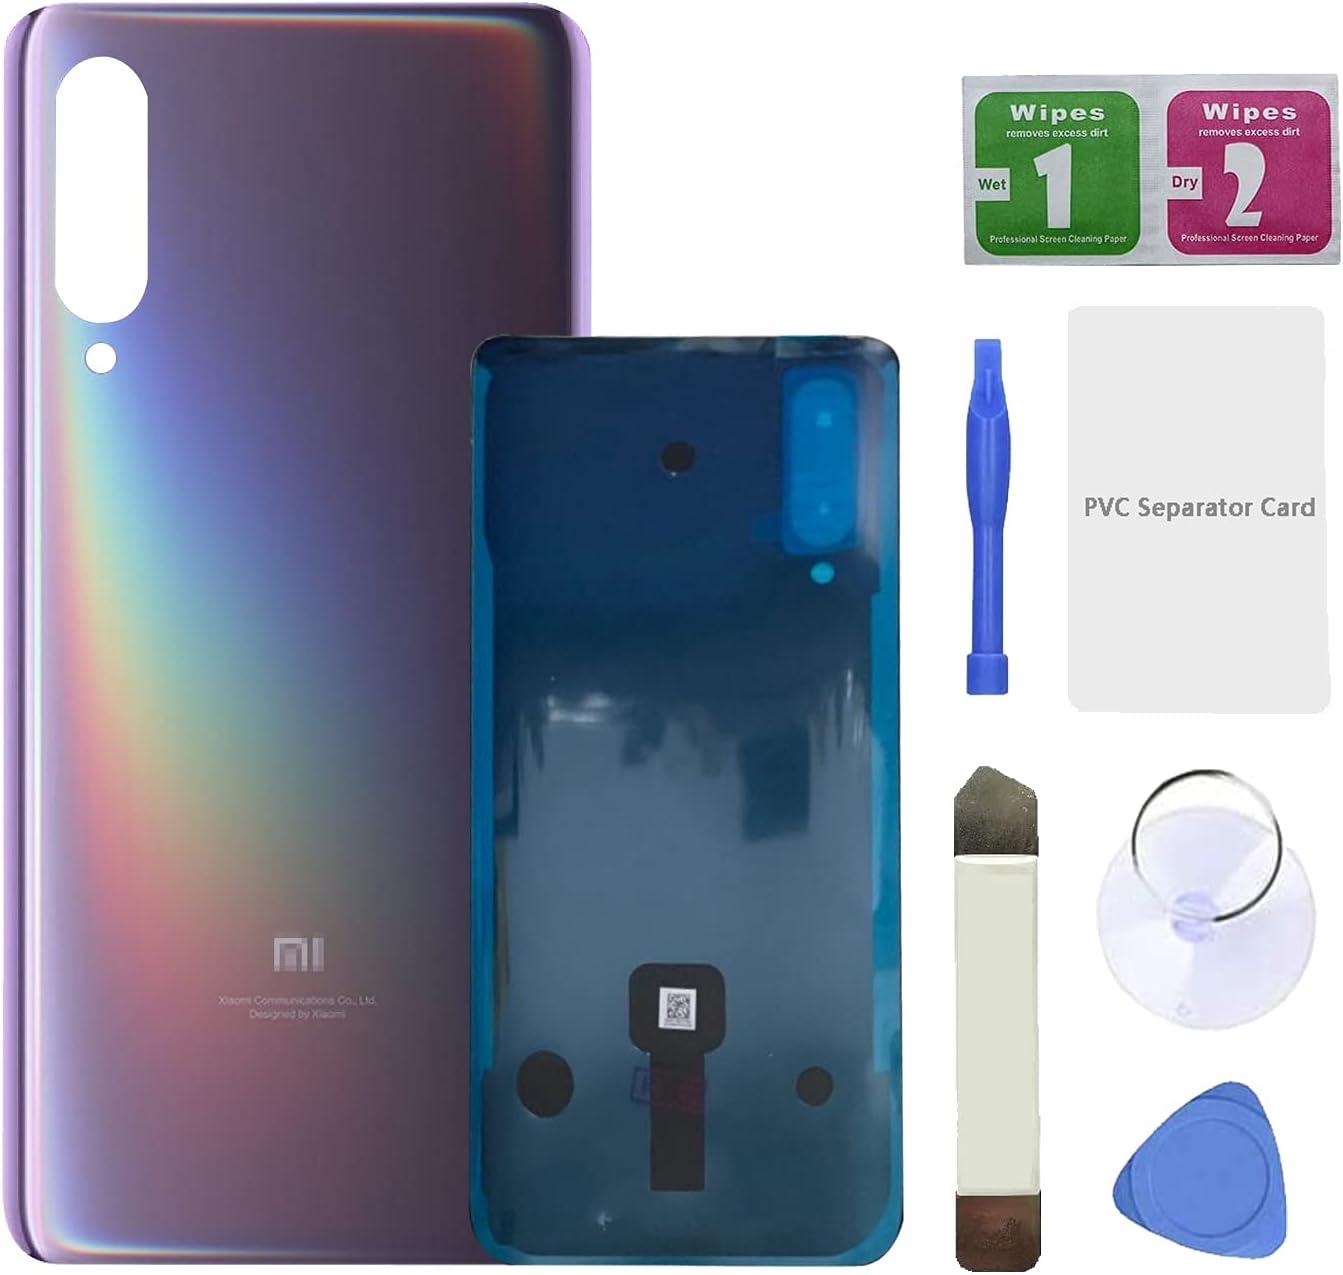 Eonpam Tapa batería Vidrio Trasera Reemplazo para (Xiaomi Mi 9) Kit reparación Original Cristal Trasero (Morado)